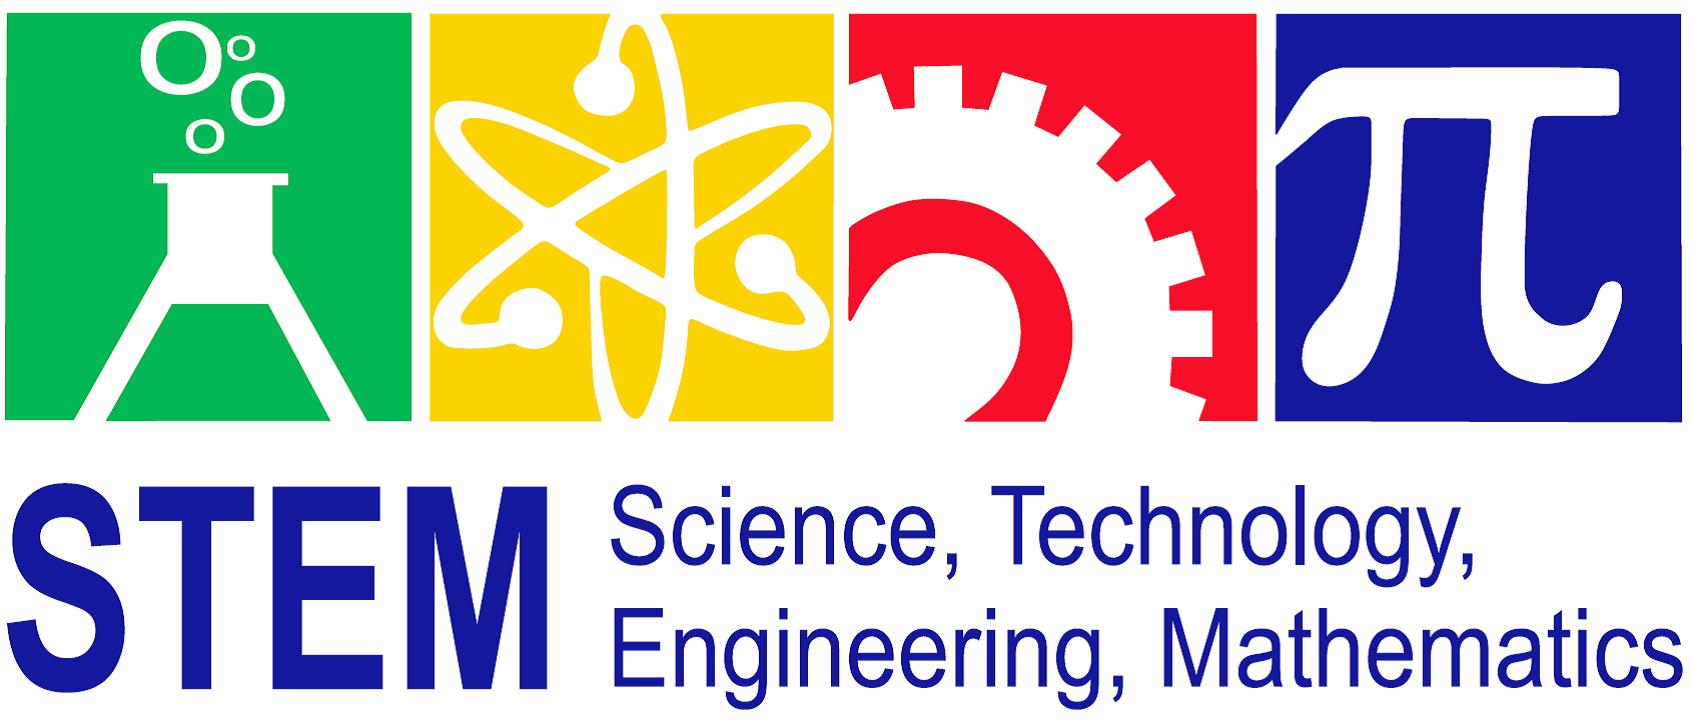 Exploring STEM (Science, Technology, Engineering, Maths)